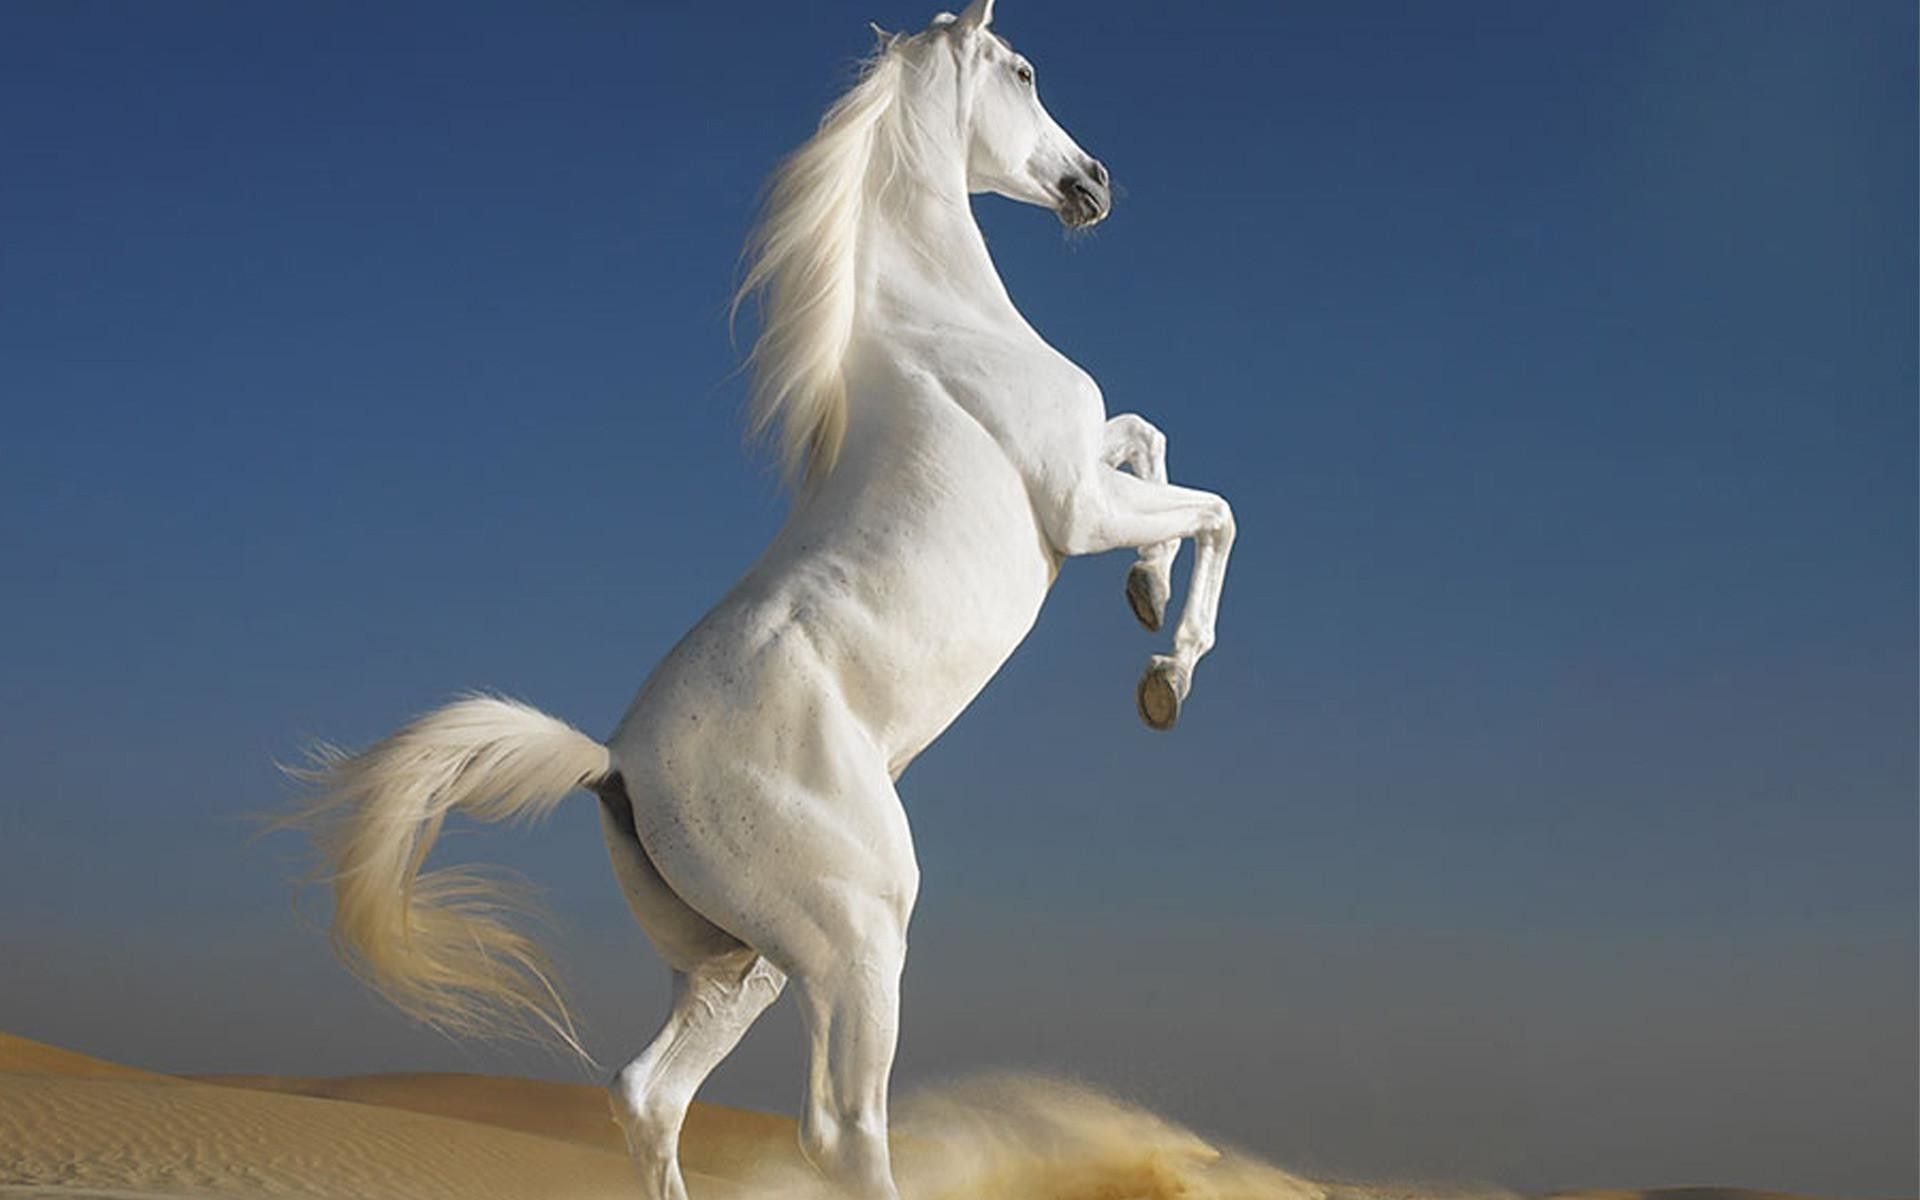 Arabian Horse Photo Gallery Wallpaper 53 Images